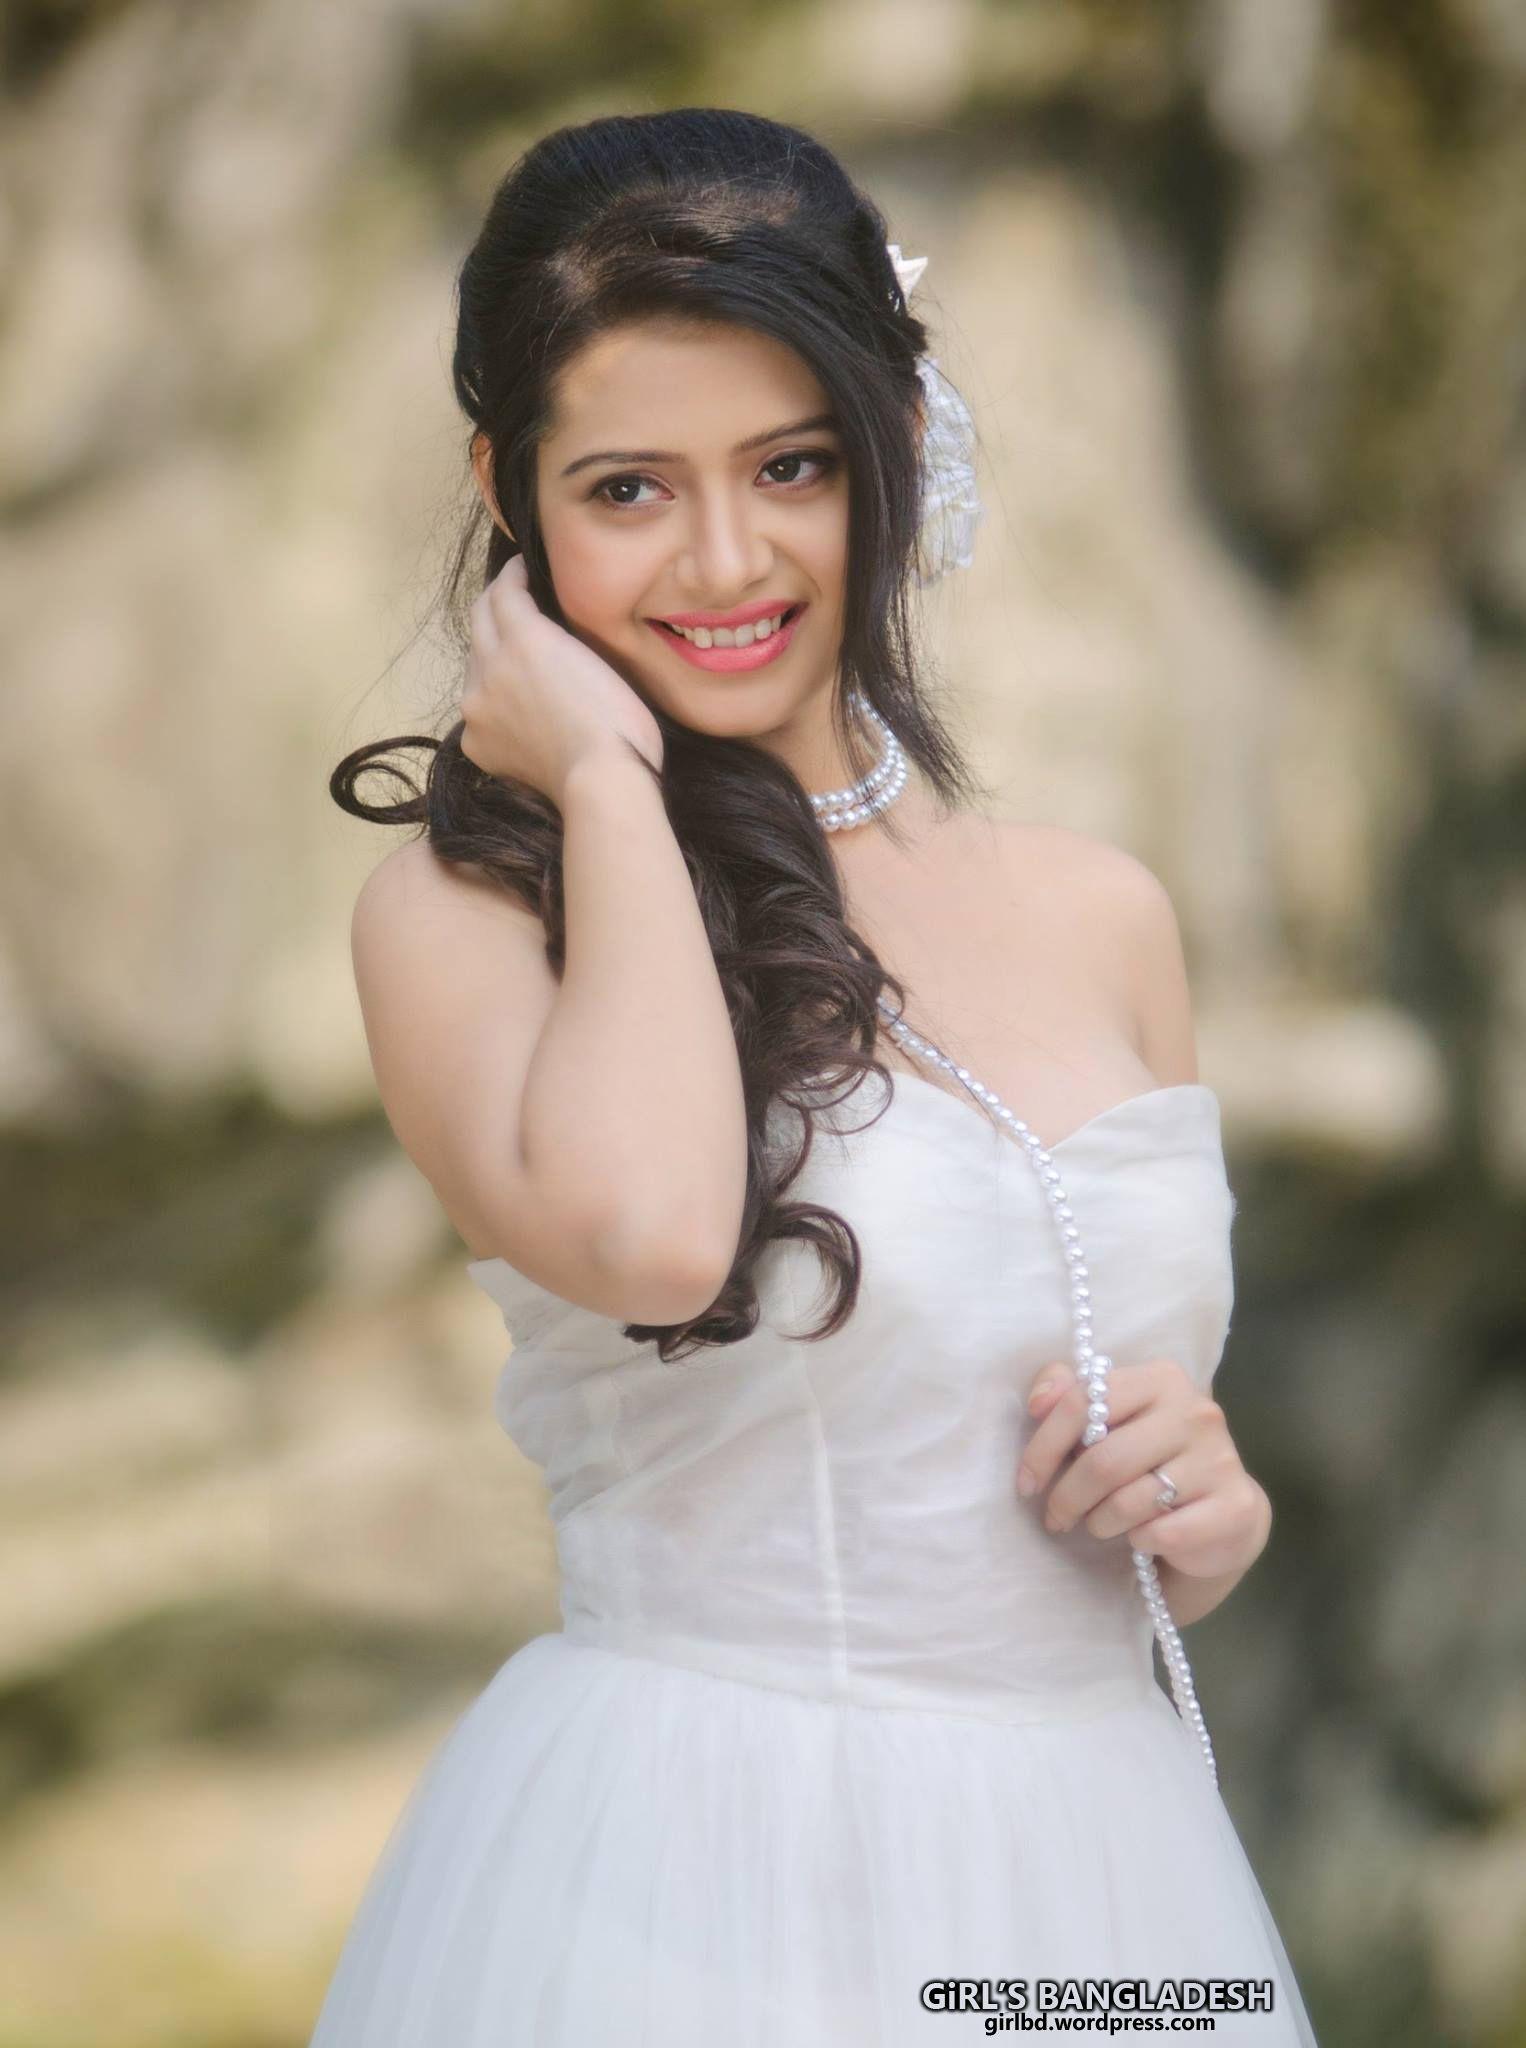 Bangladeshi sexy model picture